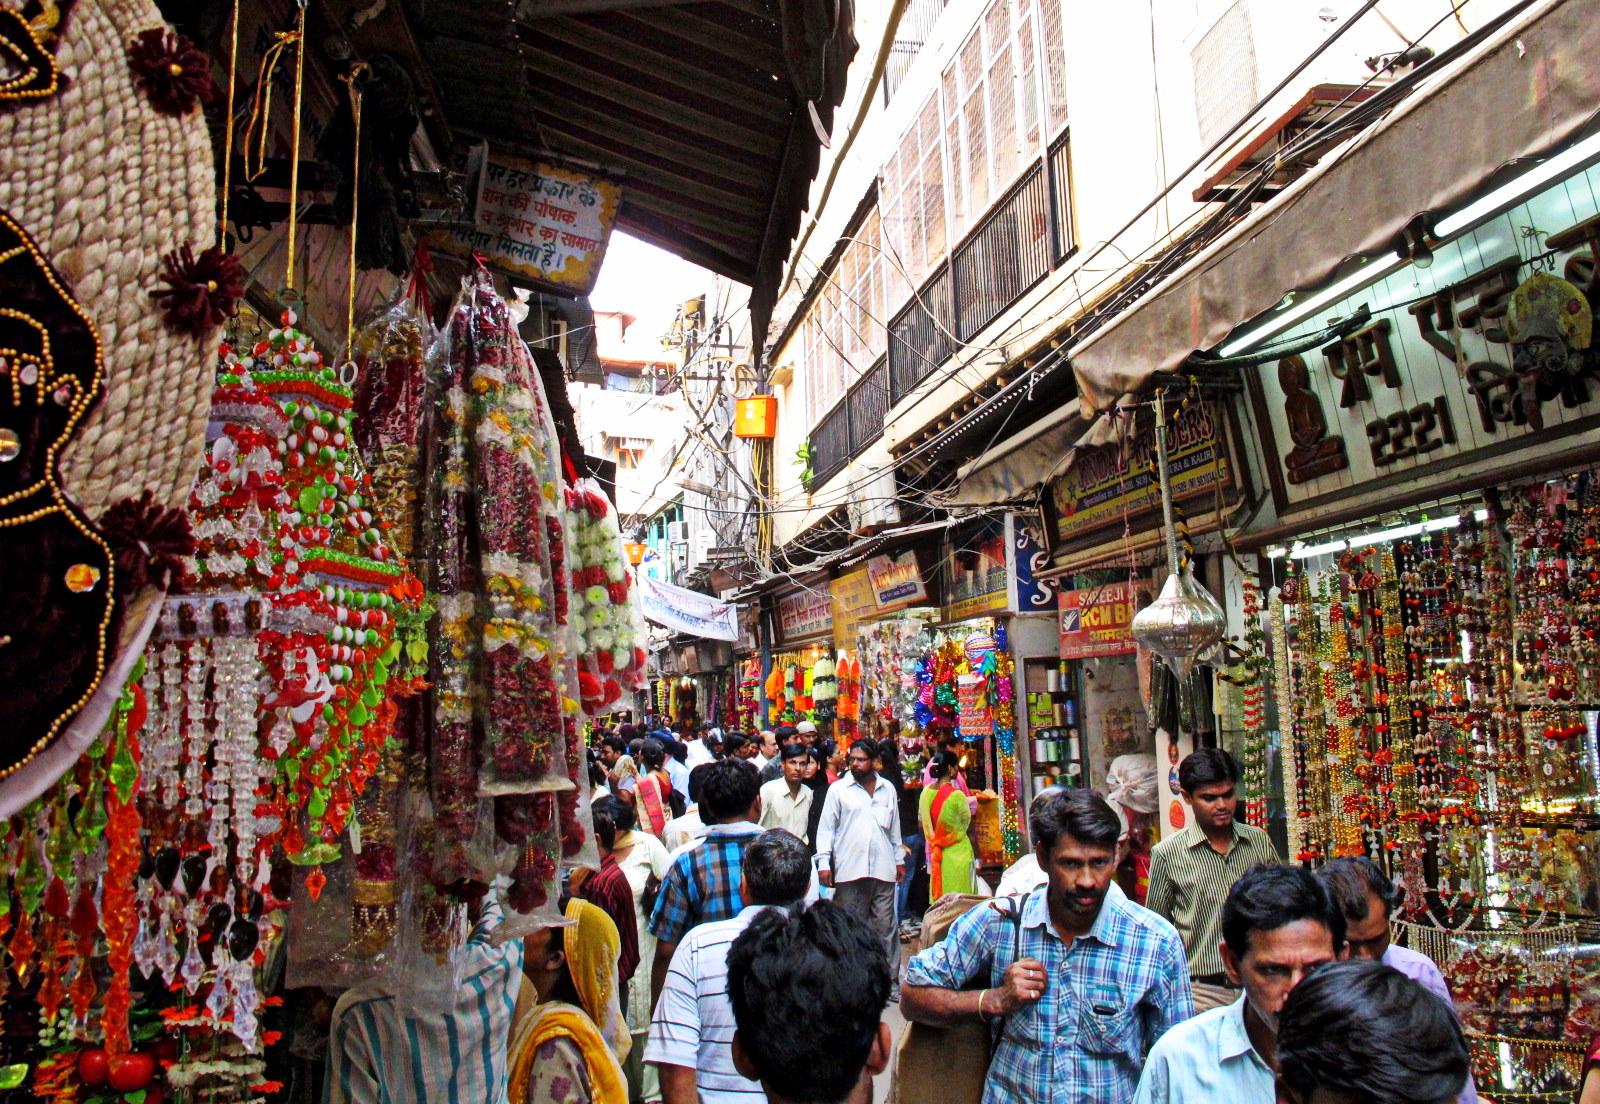 Vintage Lanes of Chandni Chowk